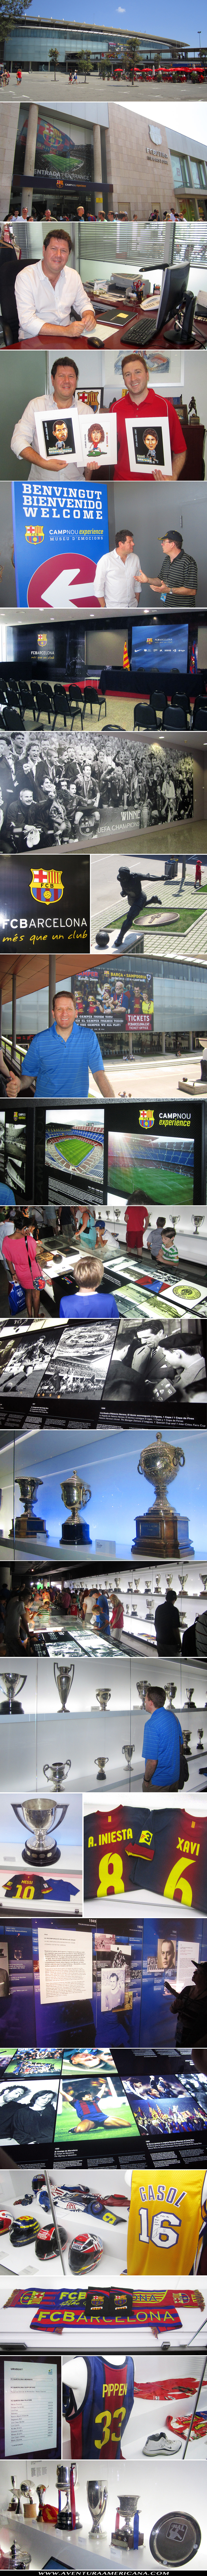 Museo Barcelona 01